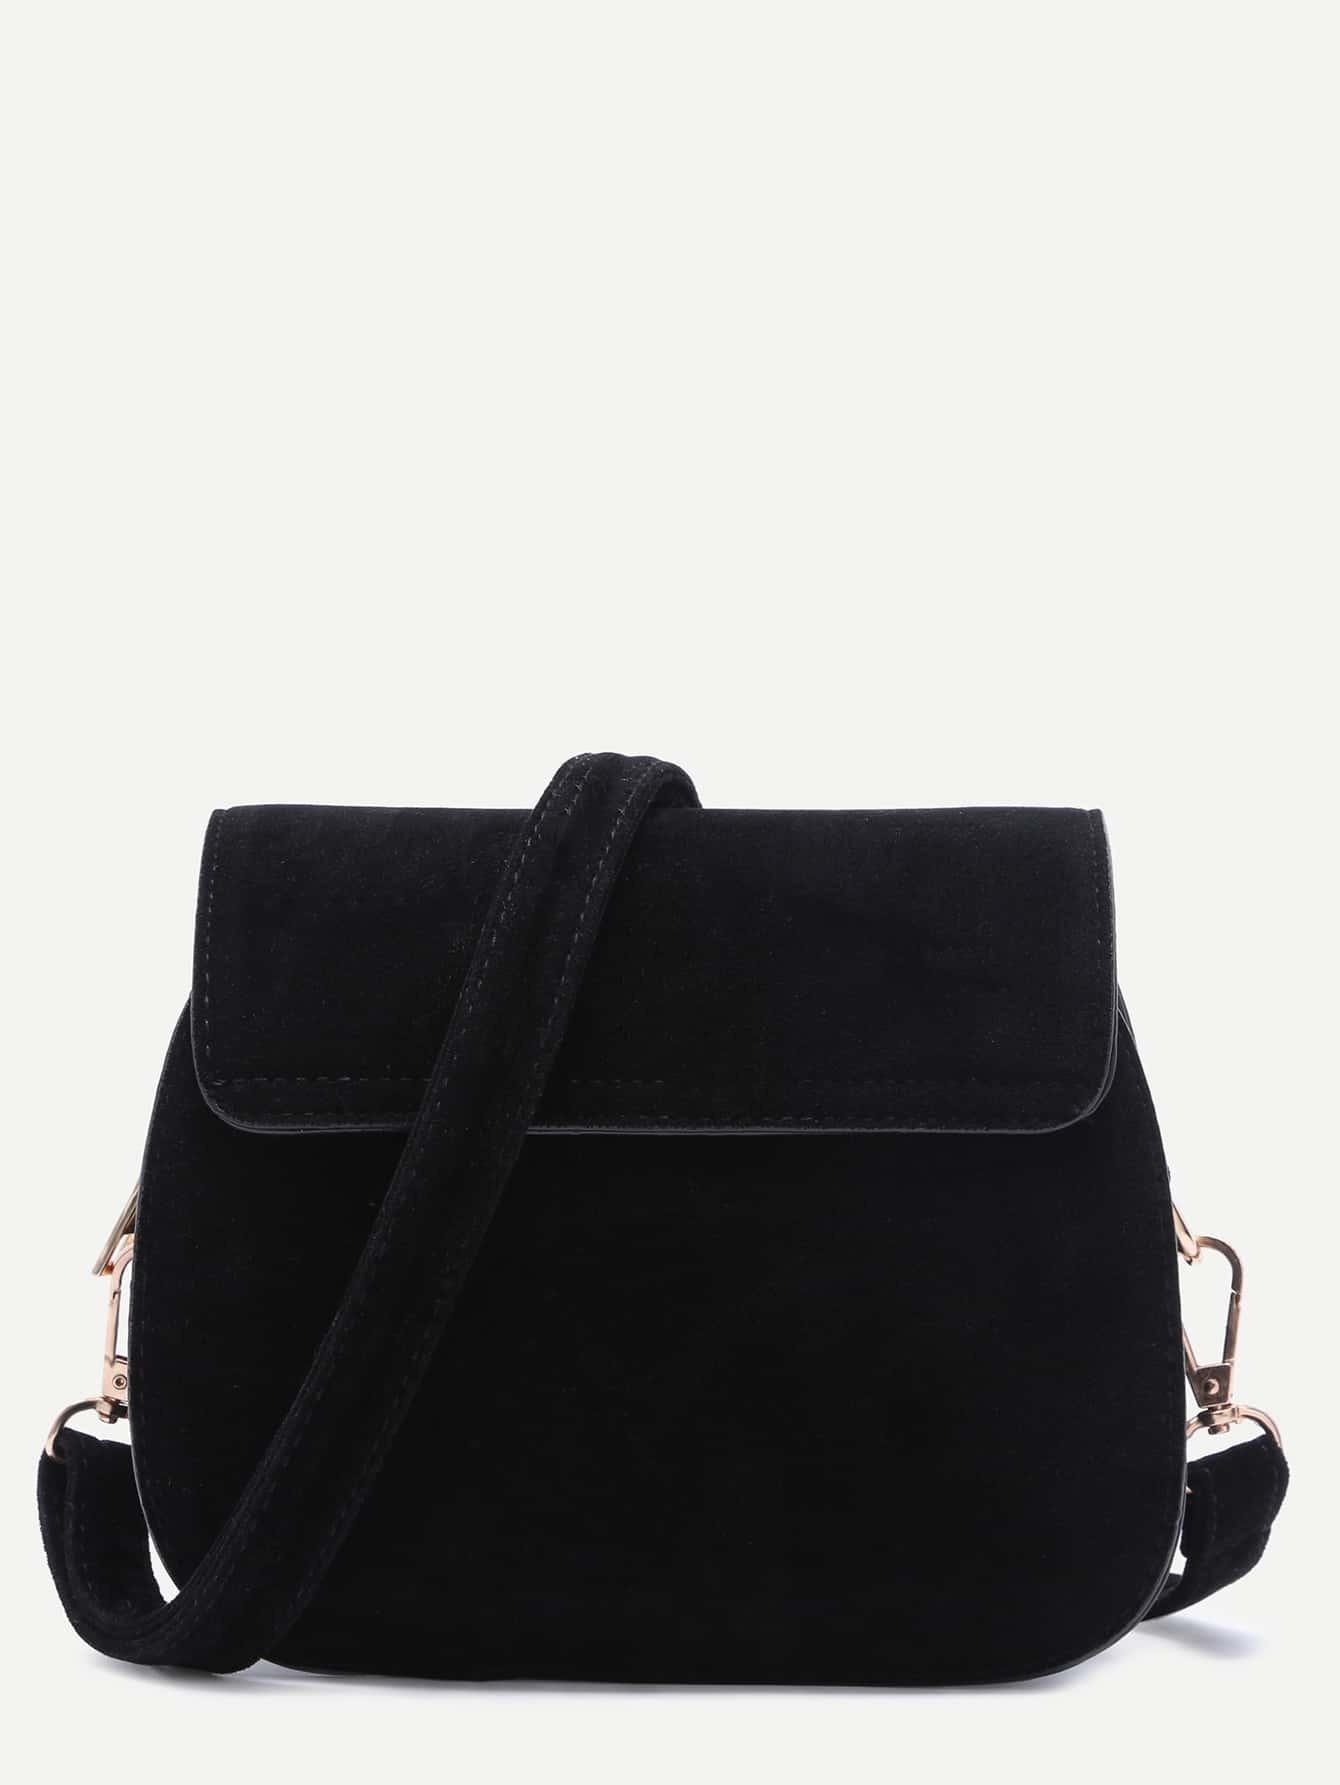 bag161017906_2